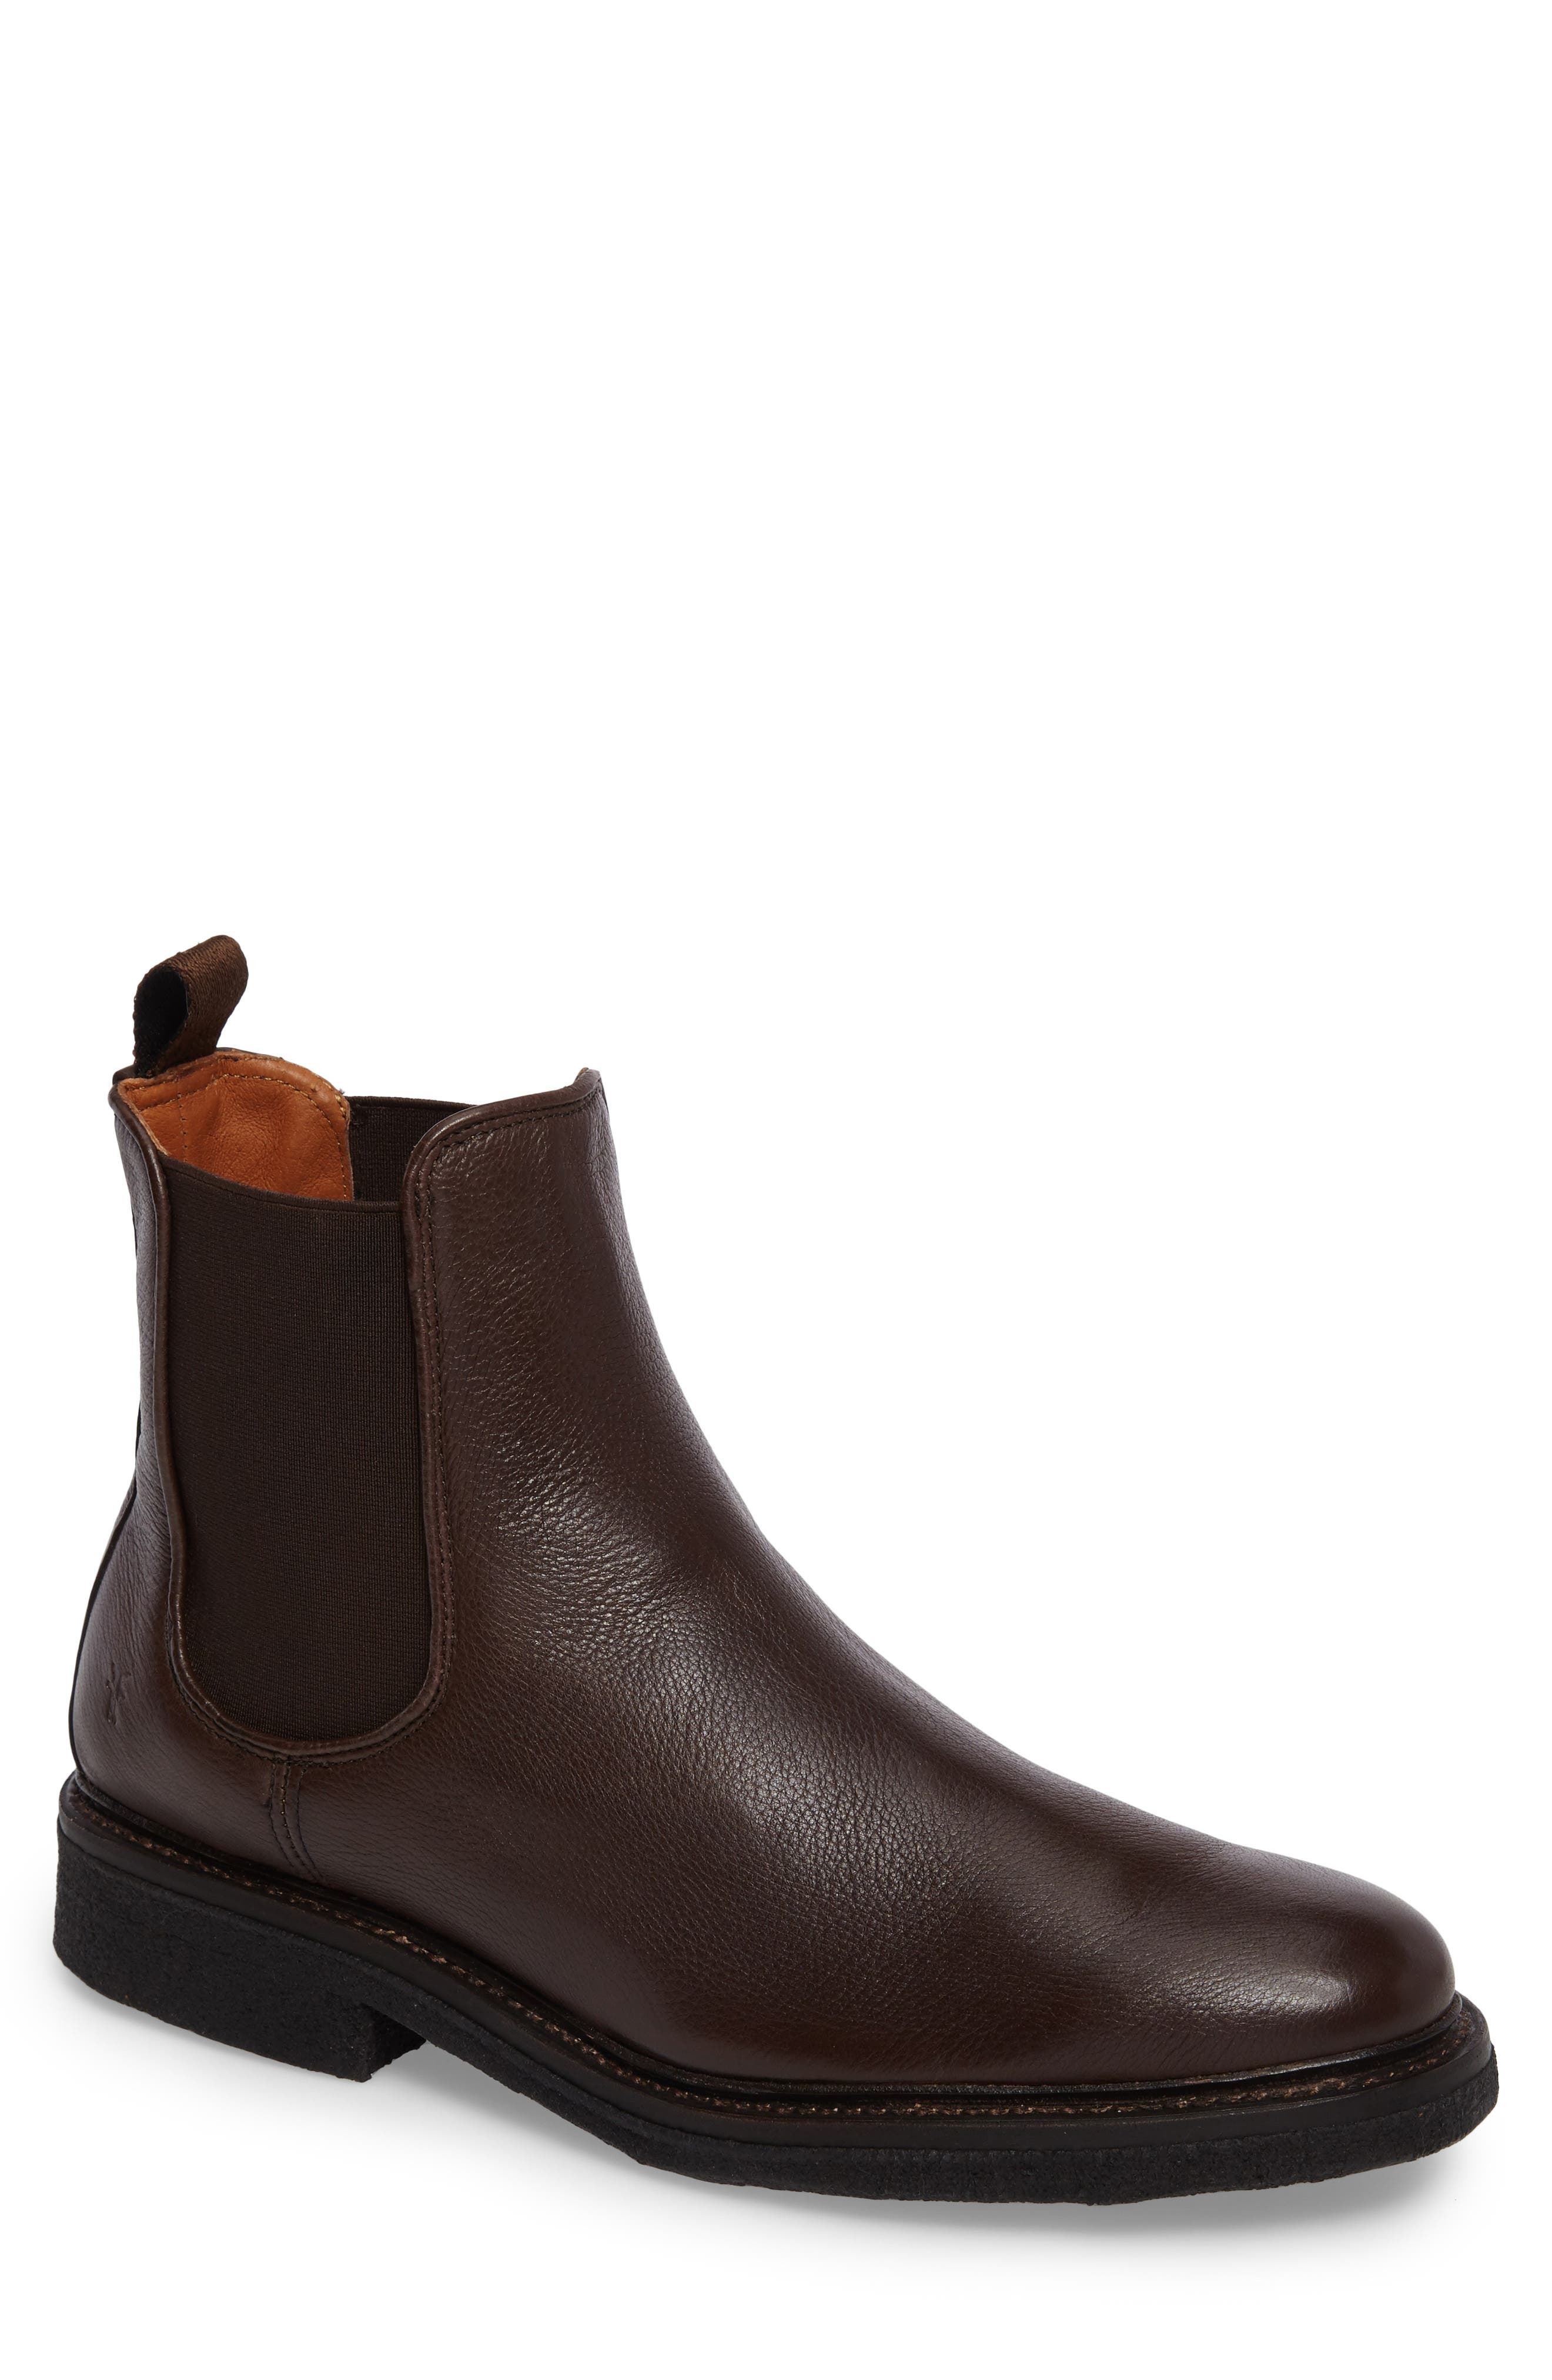 Main Image - Frye Country Chelsea Boot (Men)